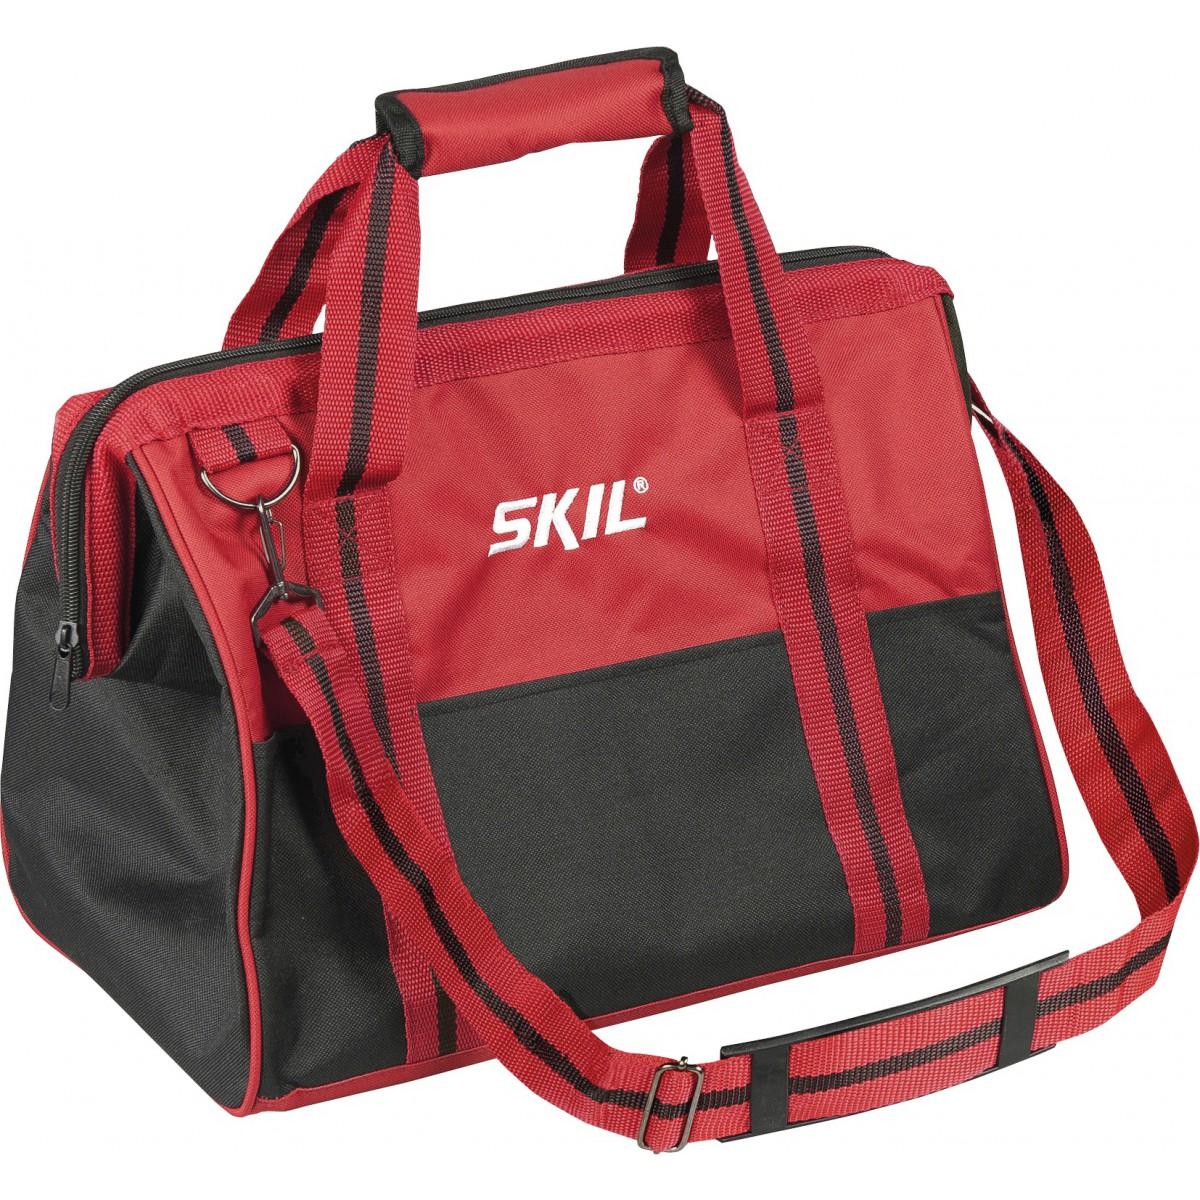 Sac de transport SKIL - Taille M